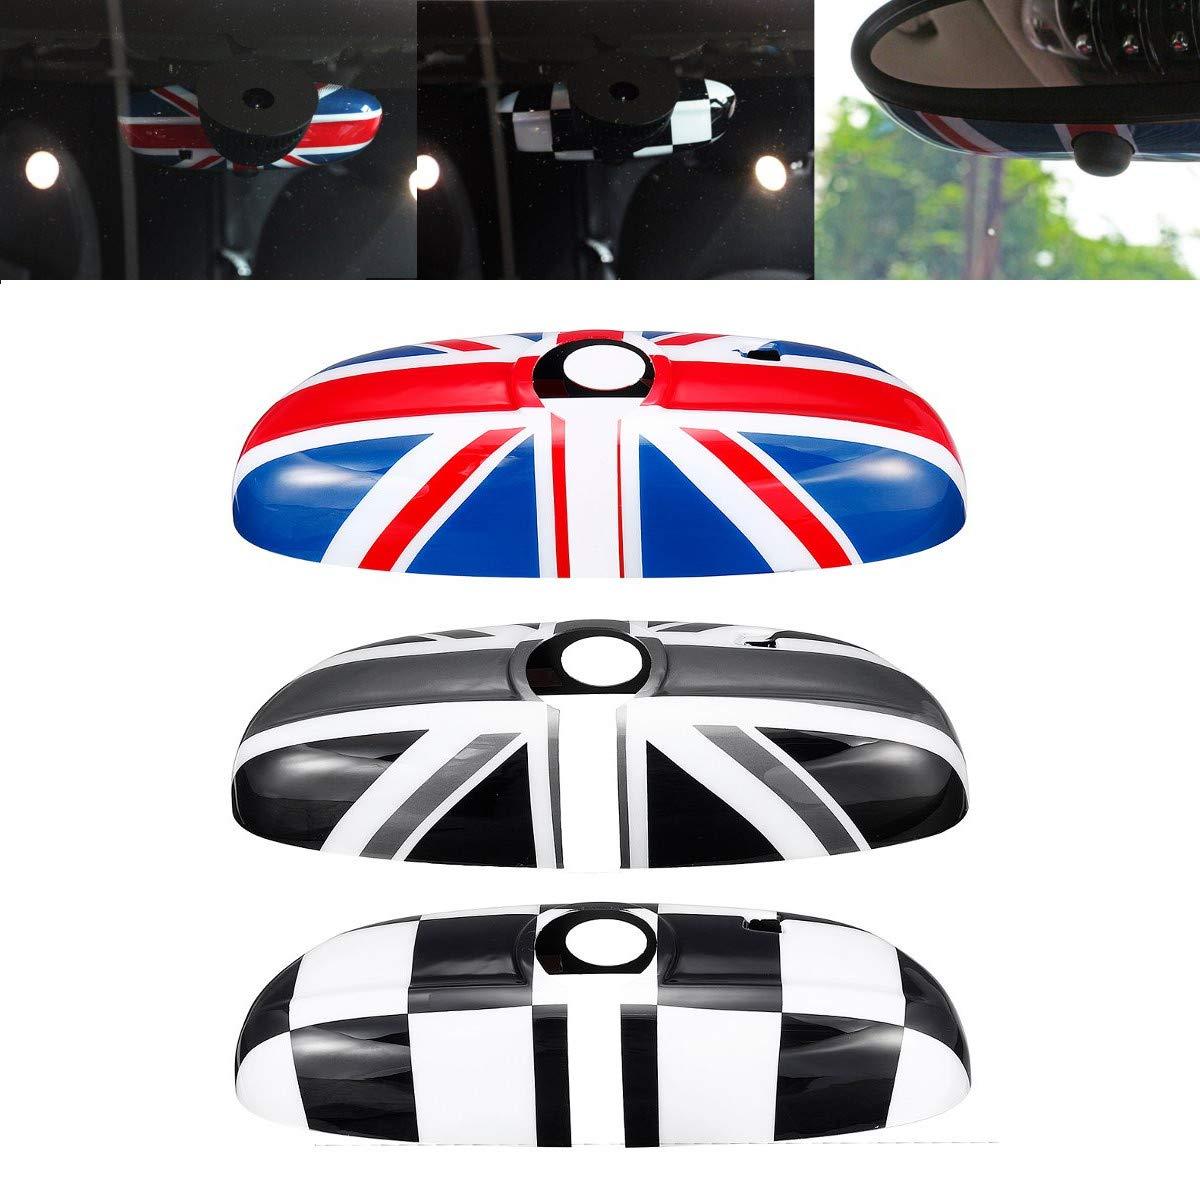 Viviance Interior del Coche Espejo Retrovisor Cubierta Shell UK Bandera para BMW Mini Cooper F55 F56 F54 F60 Versi/ón De Gama Alta Gris Negro